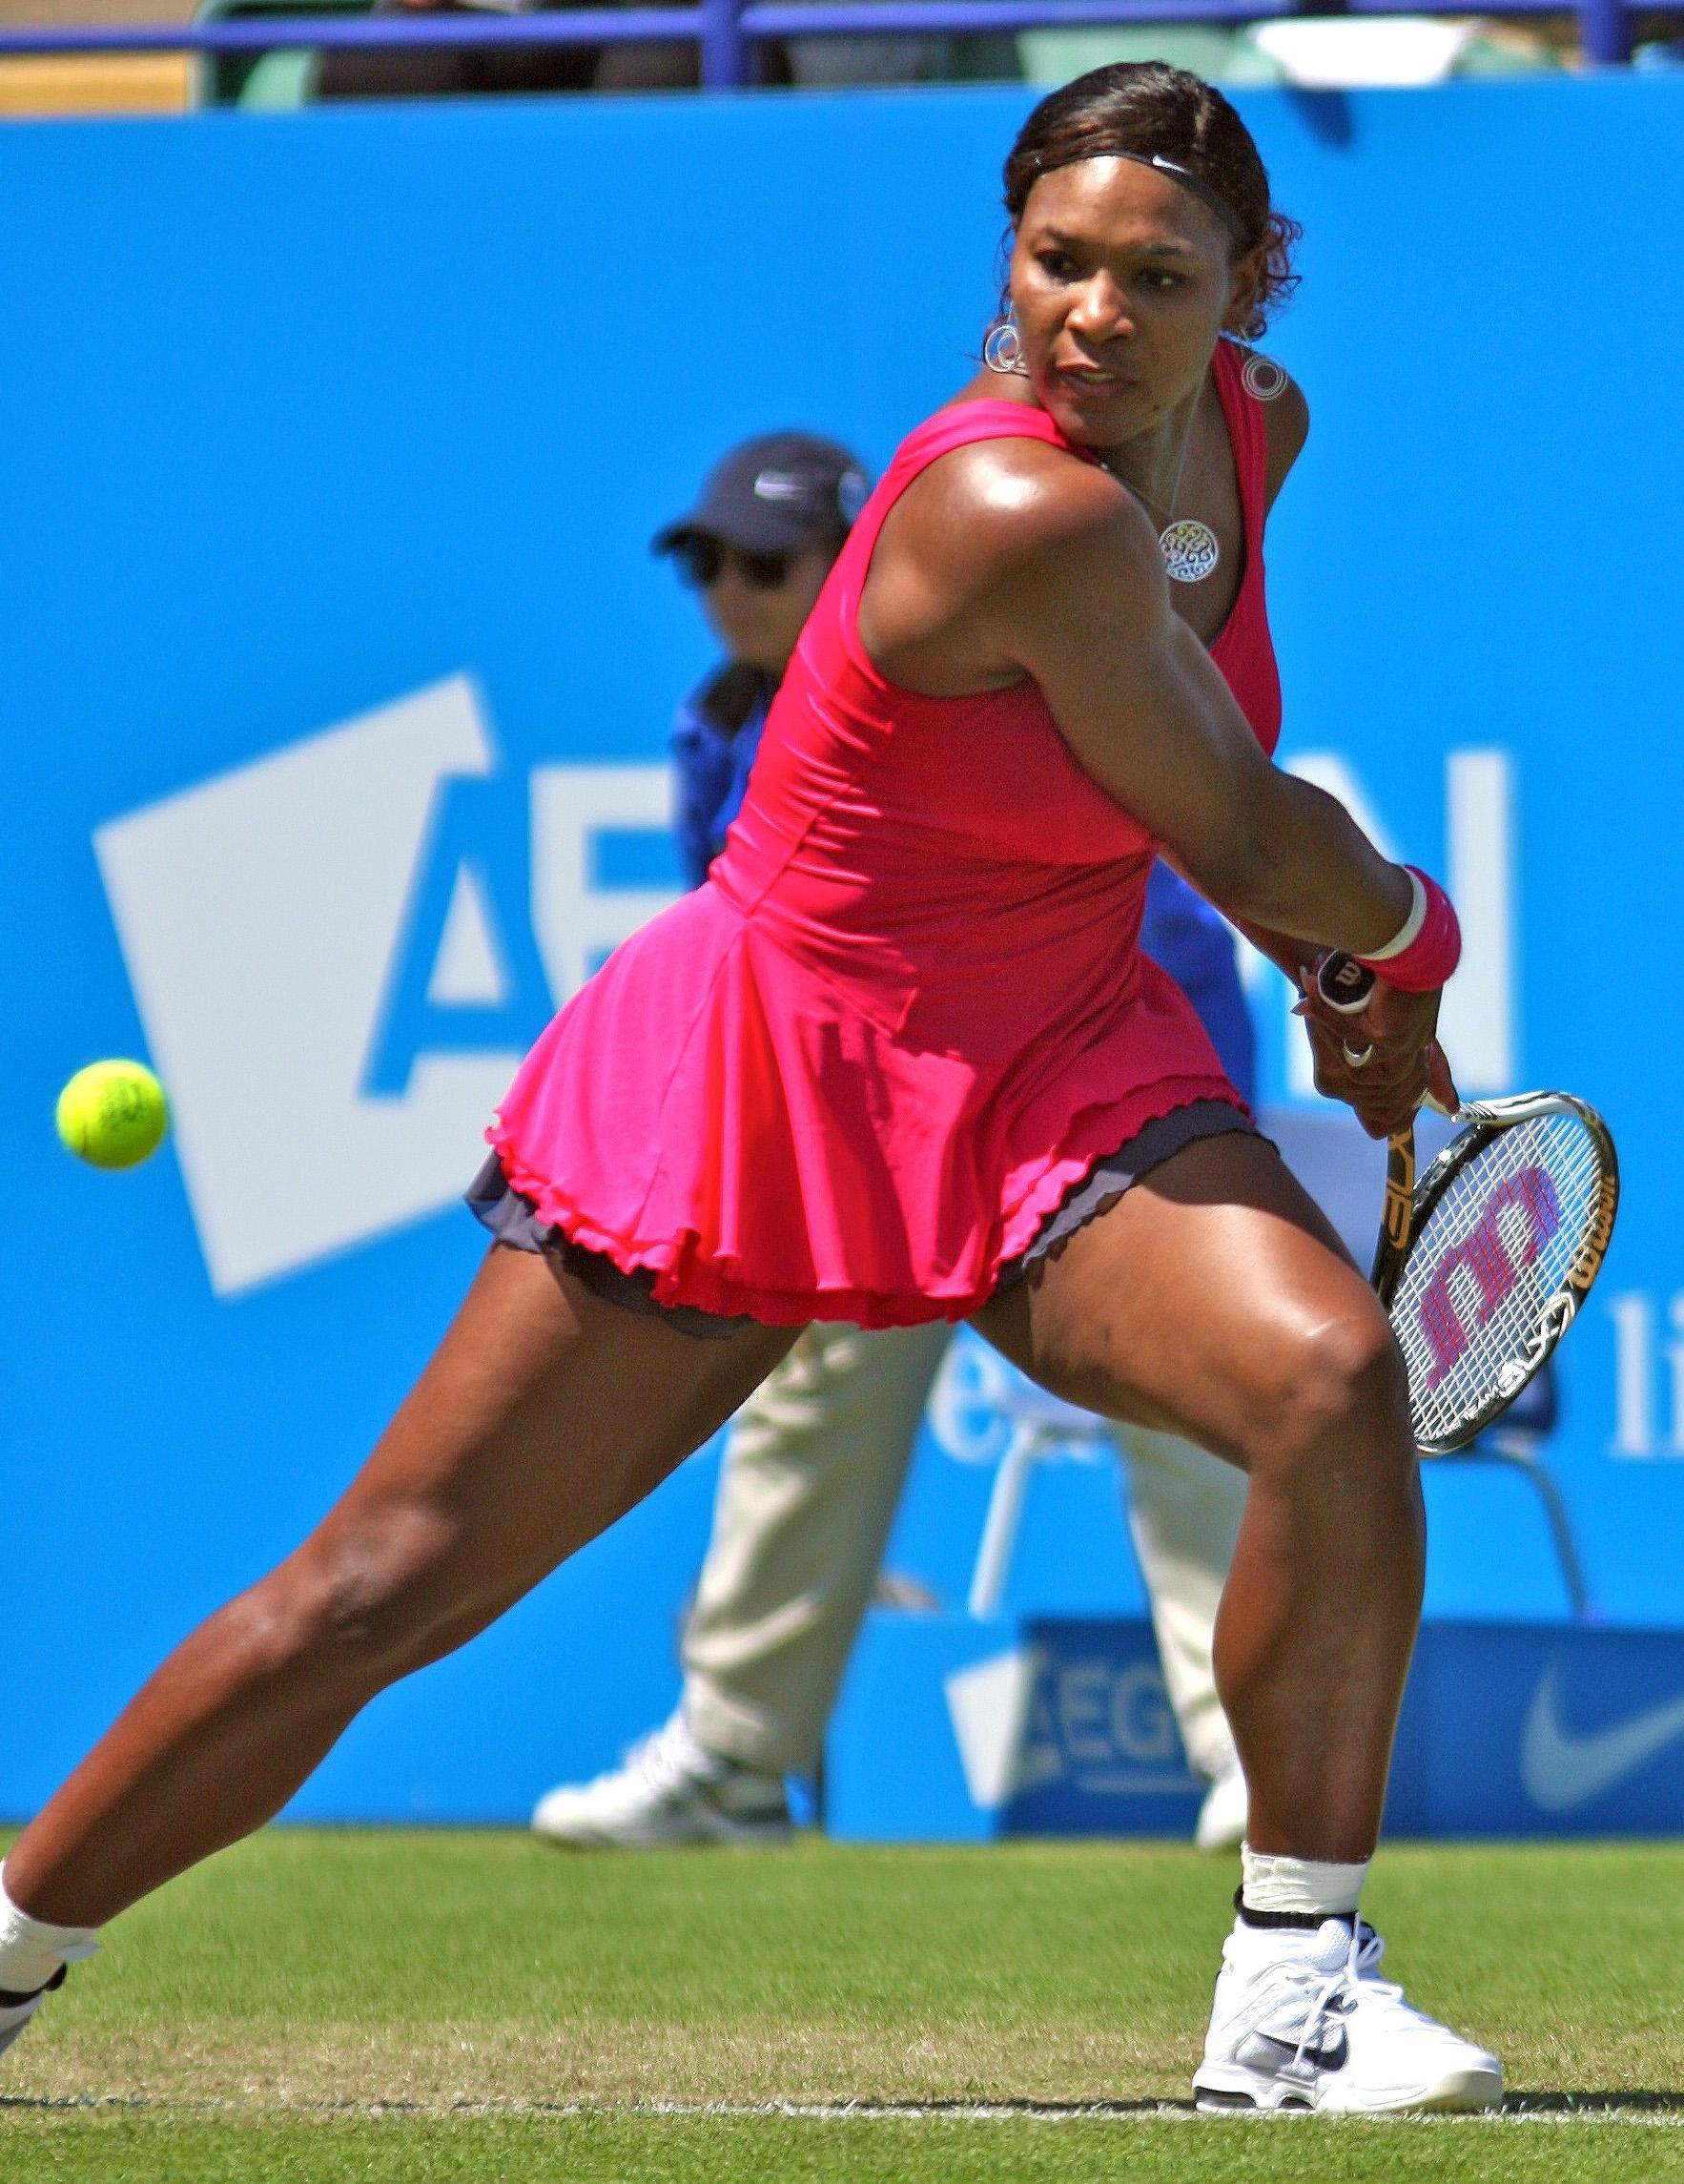 File:Serena Williams at the 2011 AEGON International.jpg - Wikipedia ... Serena